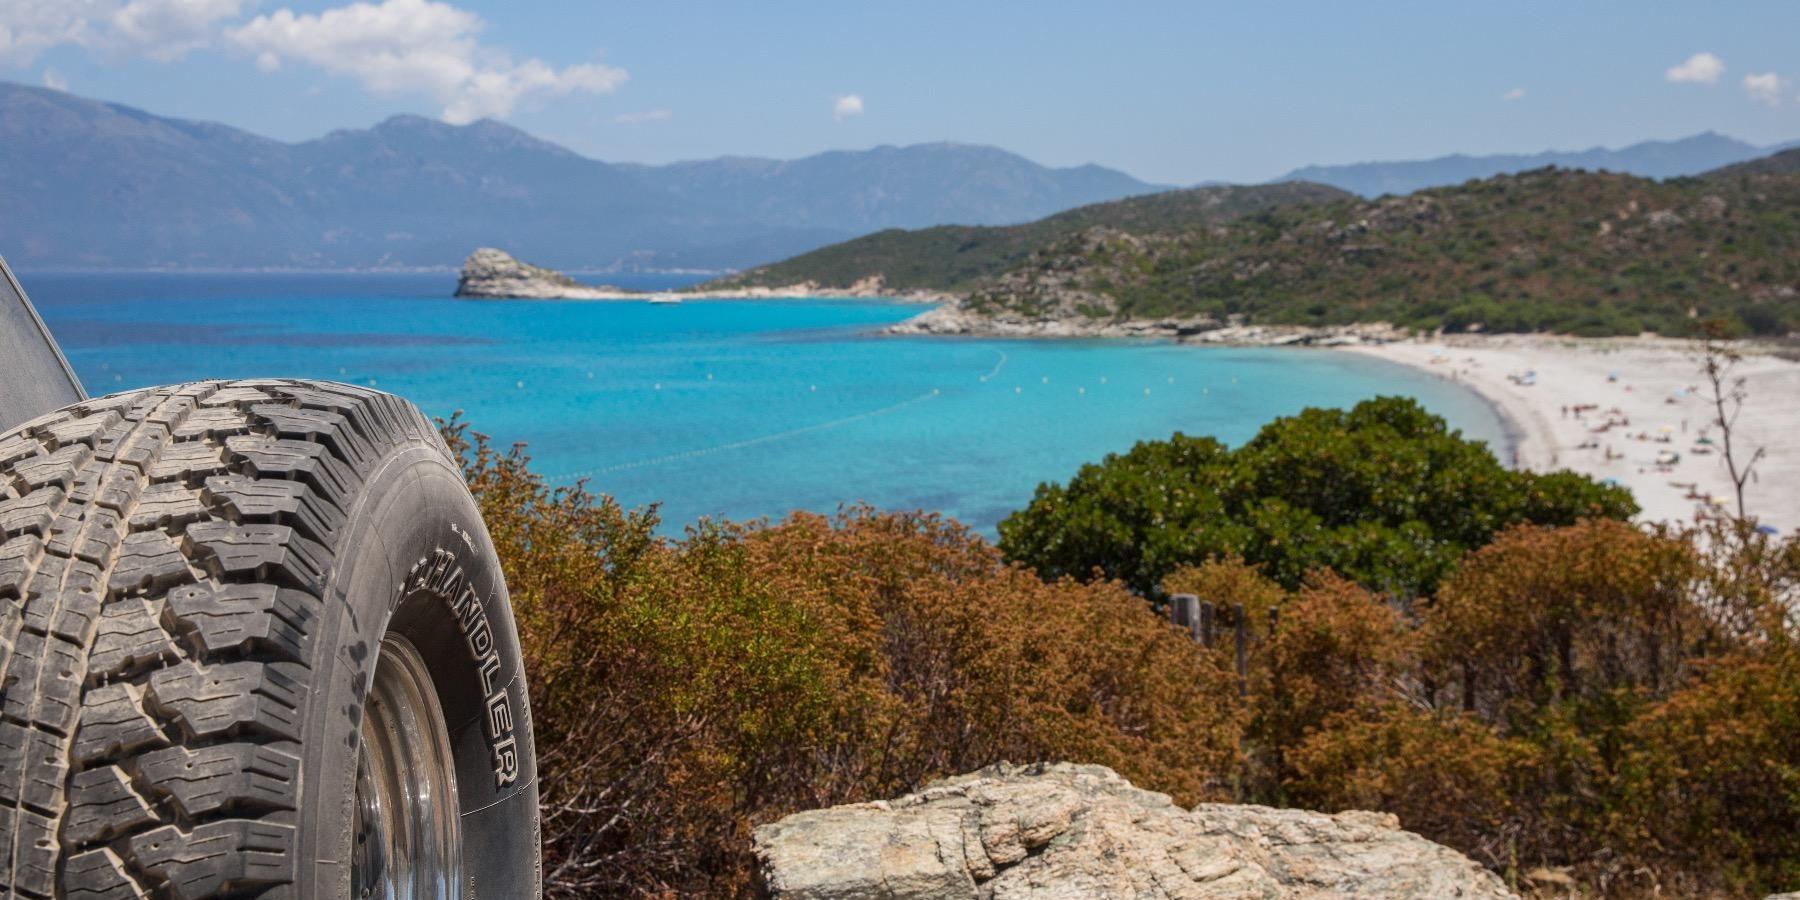 Desert des Agriates Plage de Saleccia Corsica Frankrijk terreinwagen off road 4x4 4-wheel drive strand zee maquis